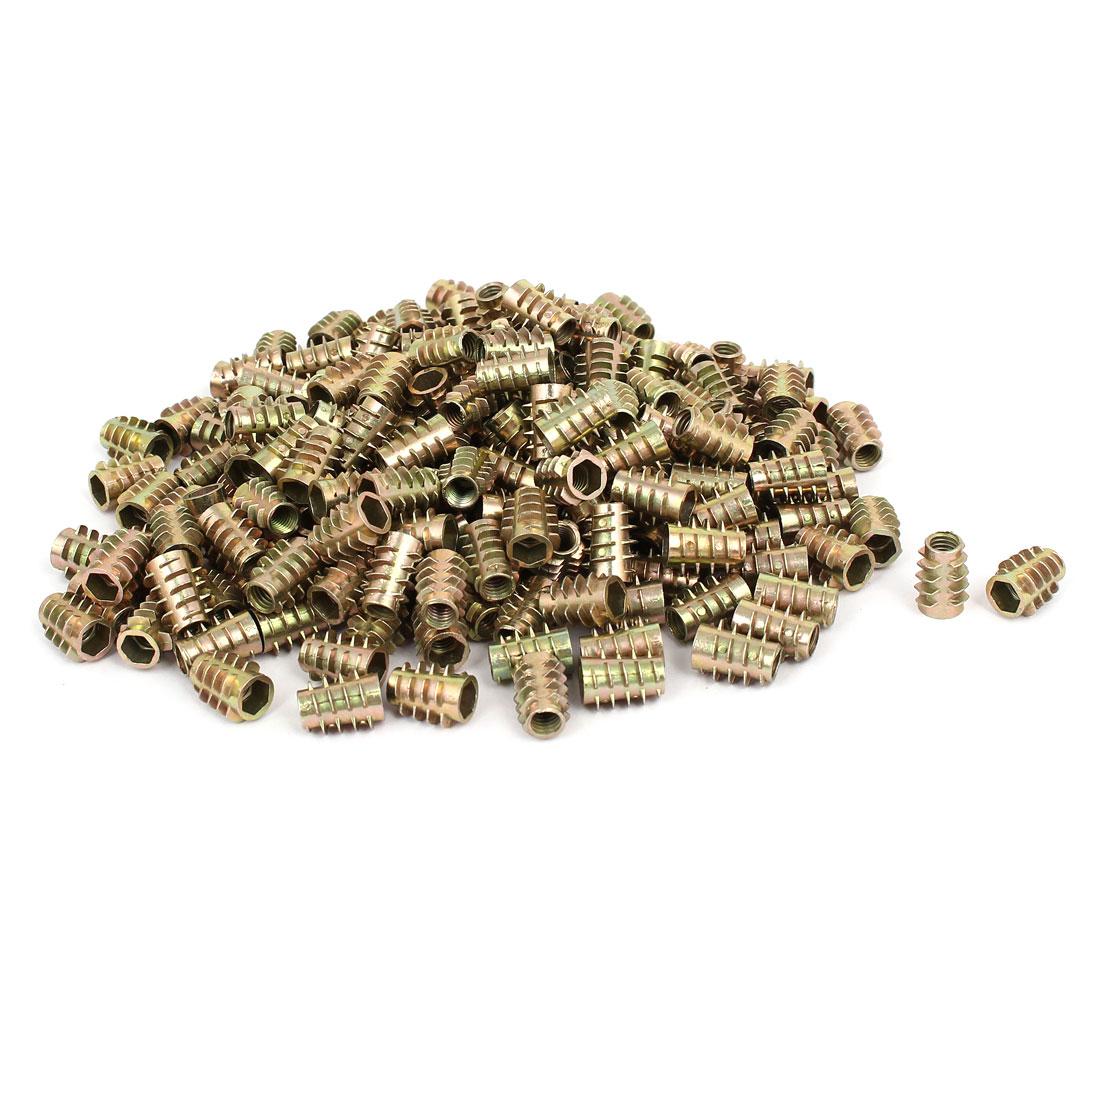 Wood Furniture Zinc Alloy Hex Socket Insert Screws E-Nuts M6x15mm 200pcs